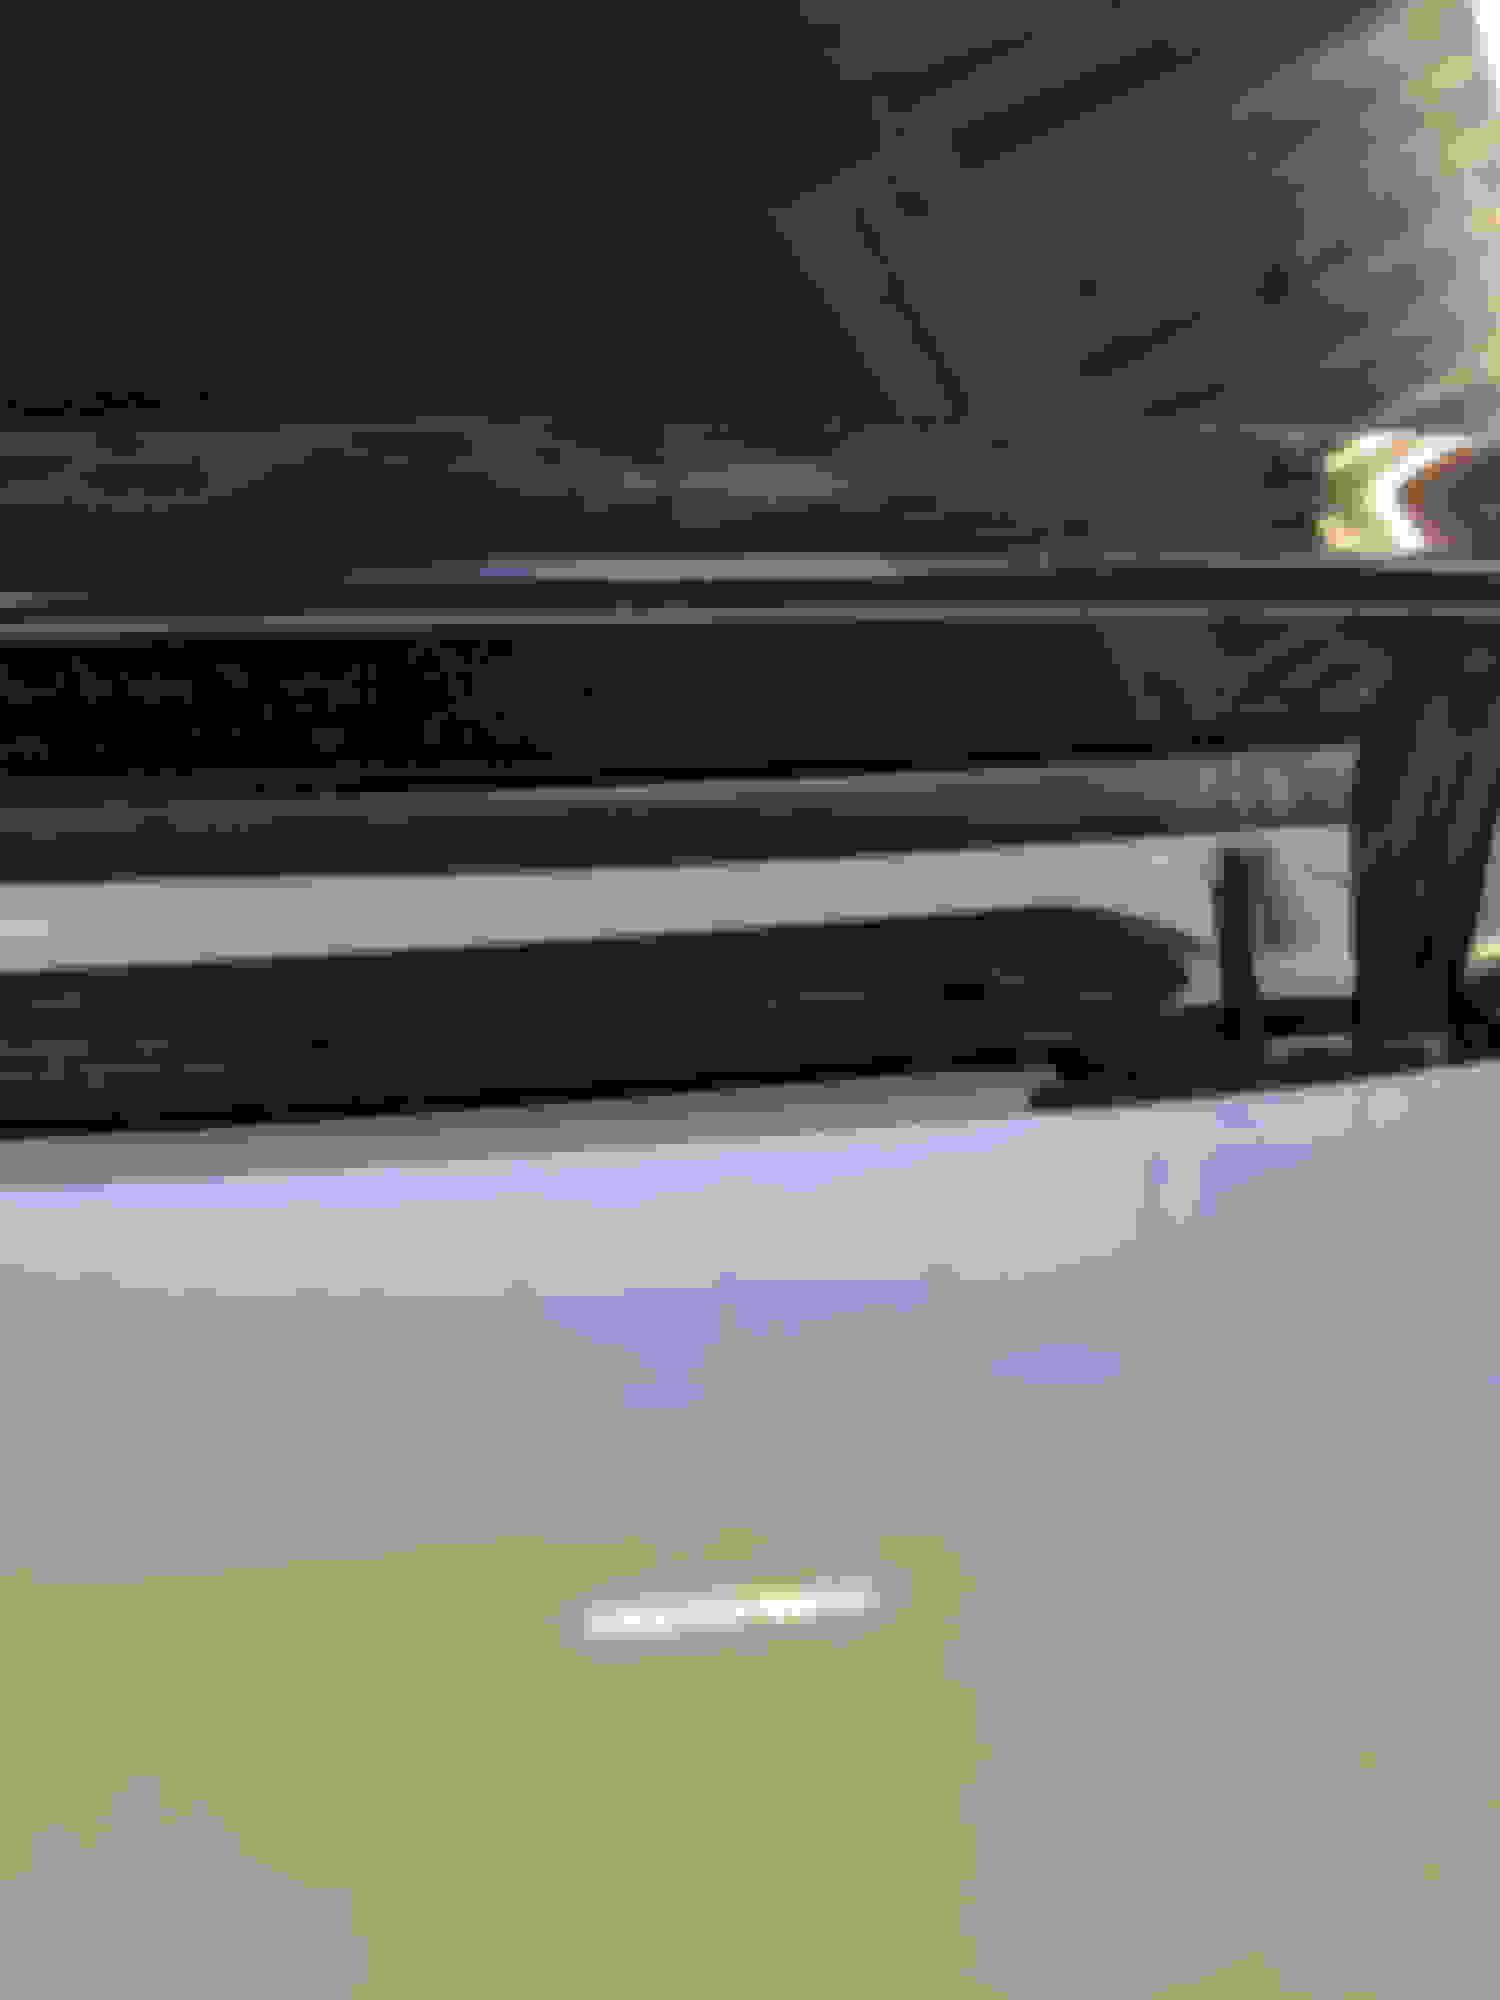 Bgtc rear spoiler - Page 3 - 6SpeedOnline - Porsche Forum